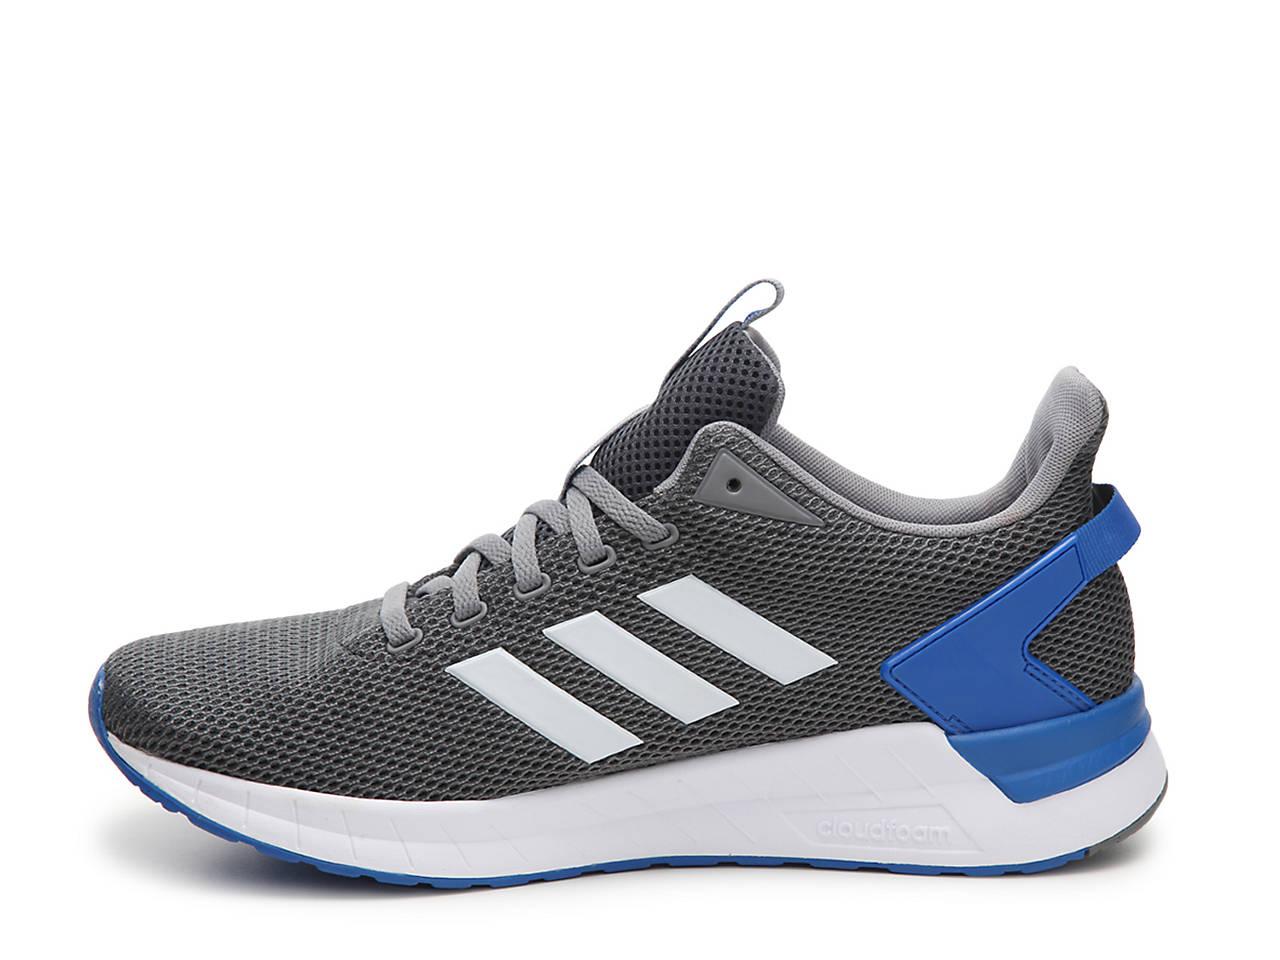 4694820466d58f adidas Questar Ride Running Shoe - Men s Men s Shoes